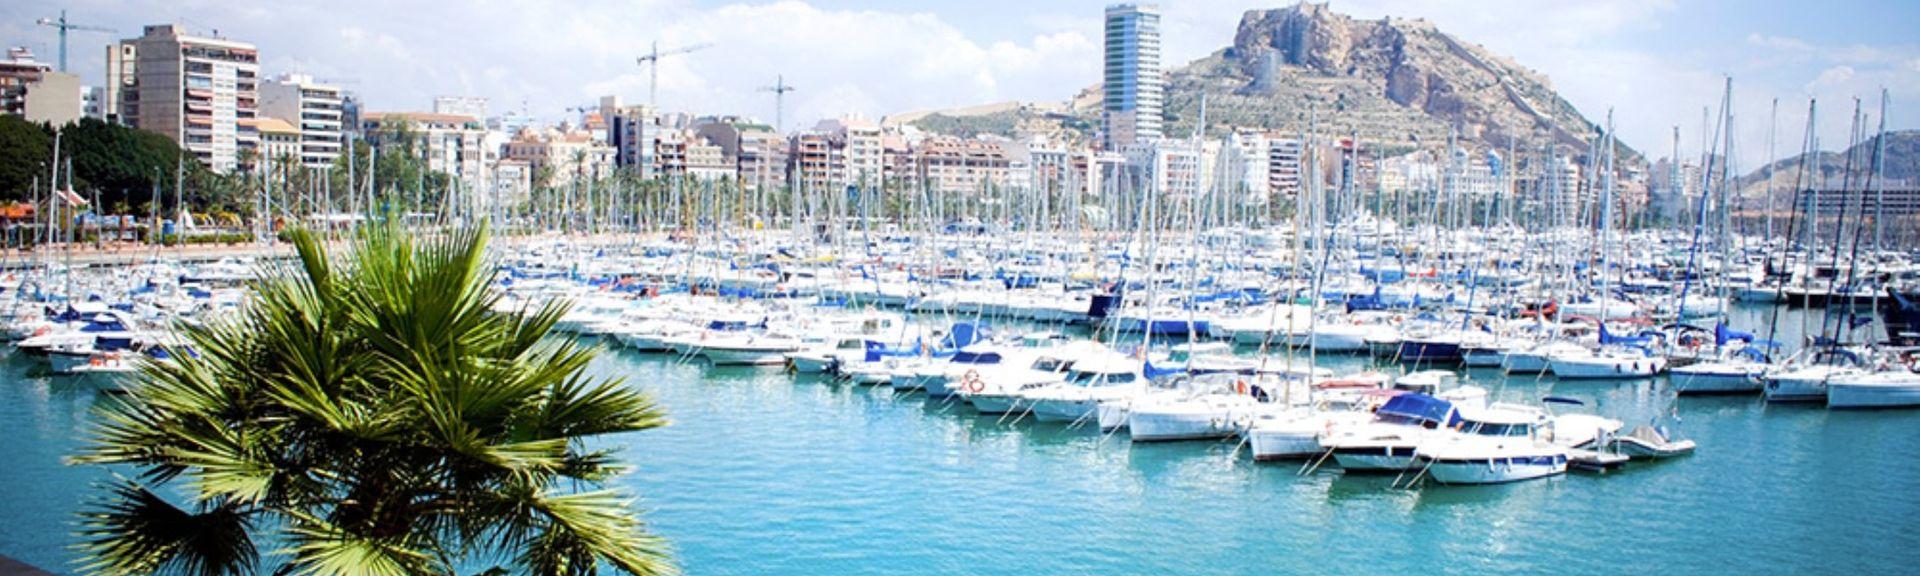 Urbanova, Alicante, Valencian itsehallintoalue, Espanja